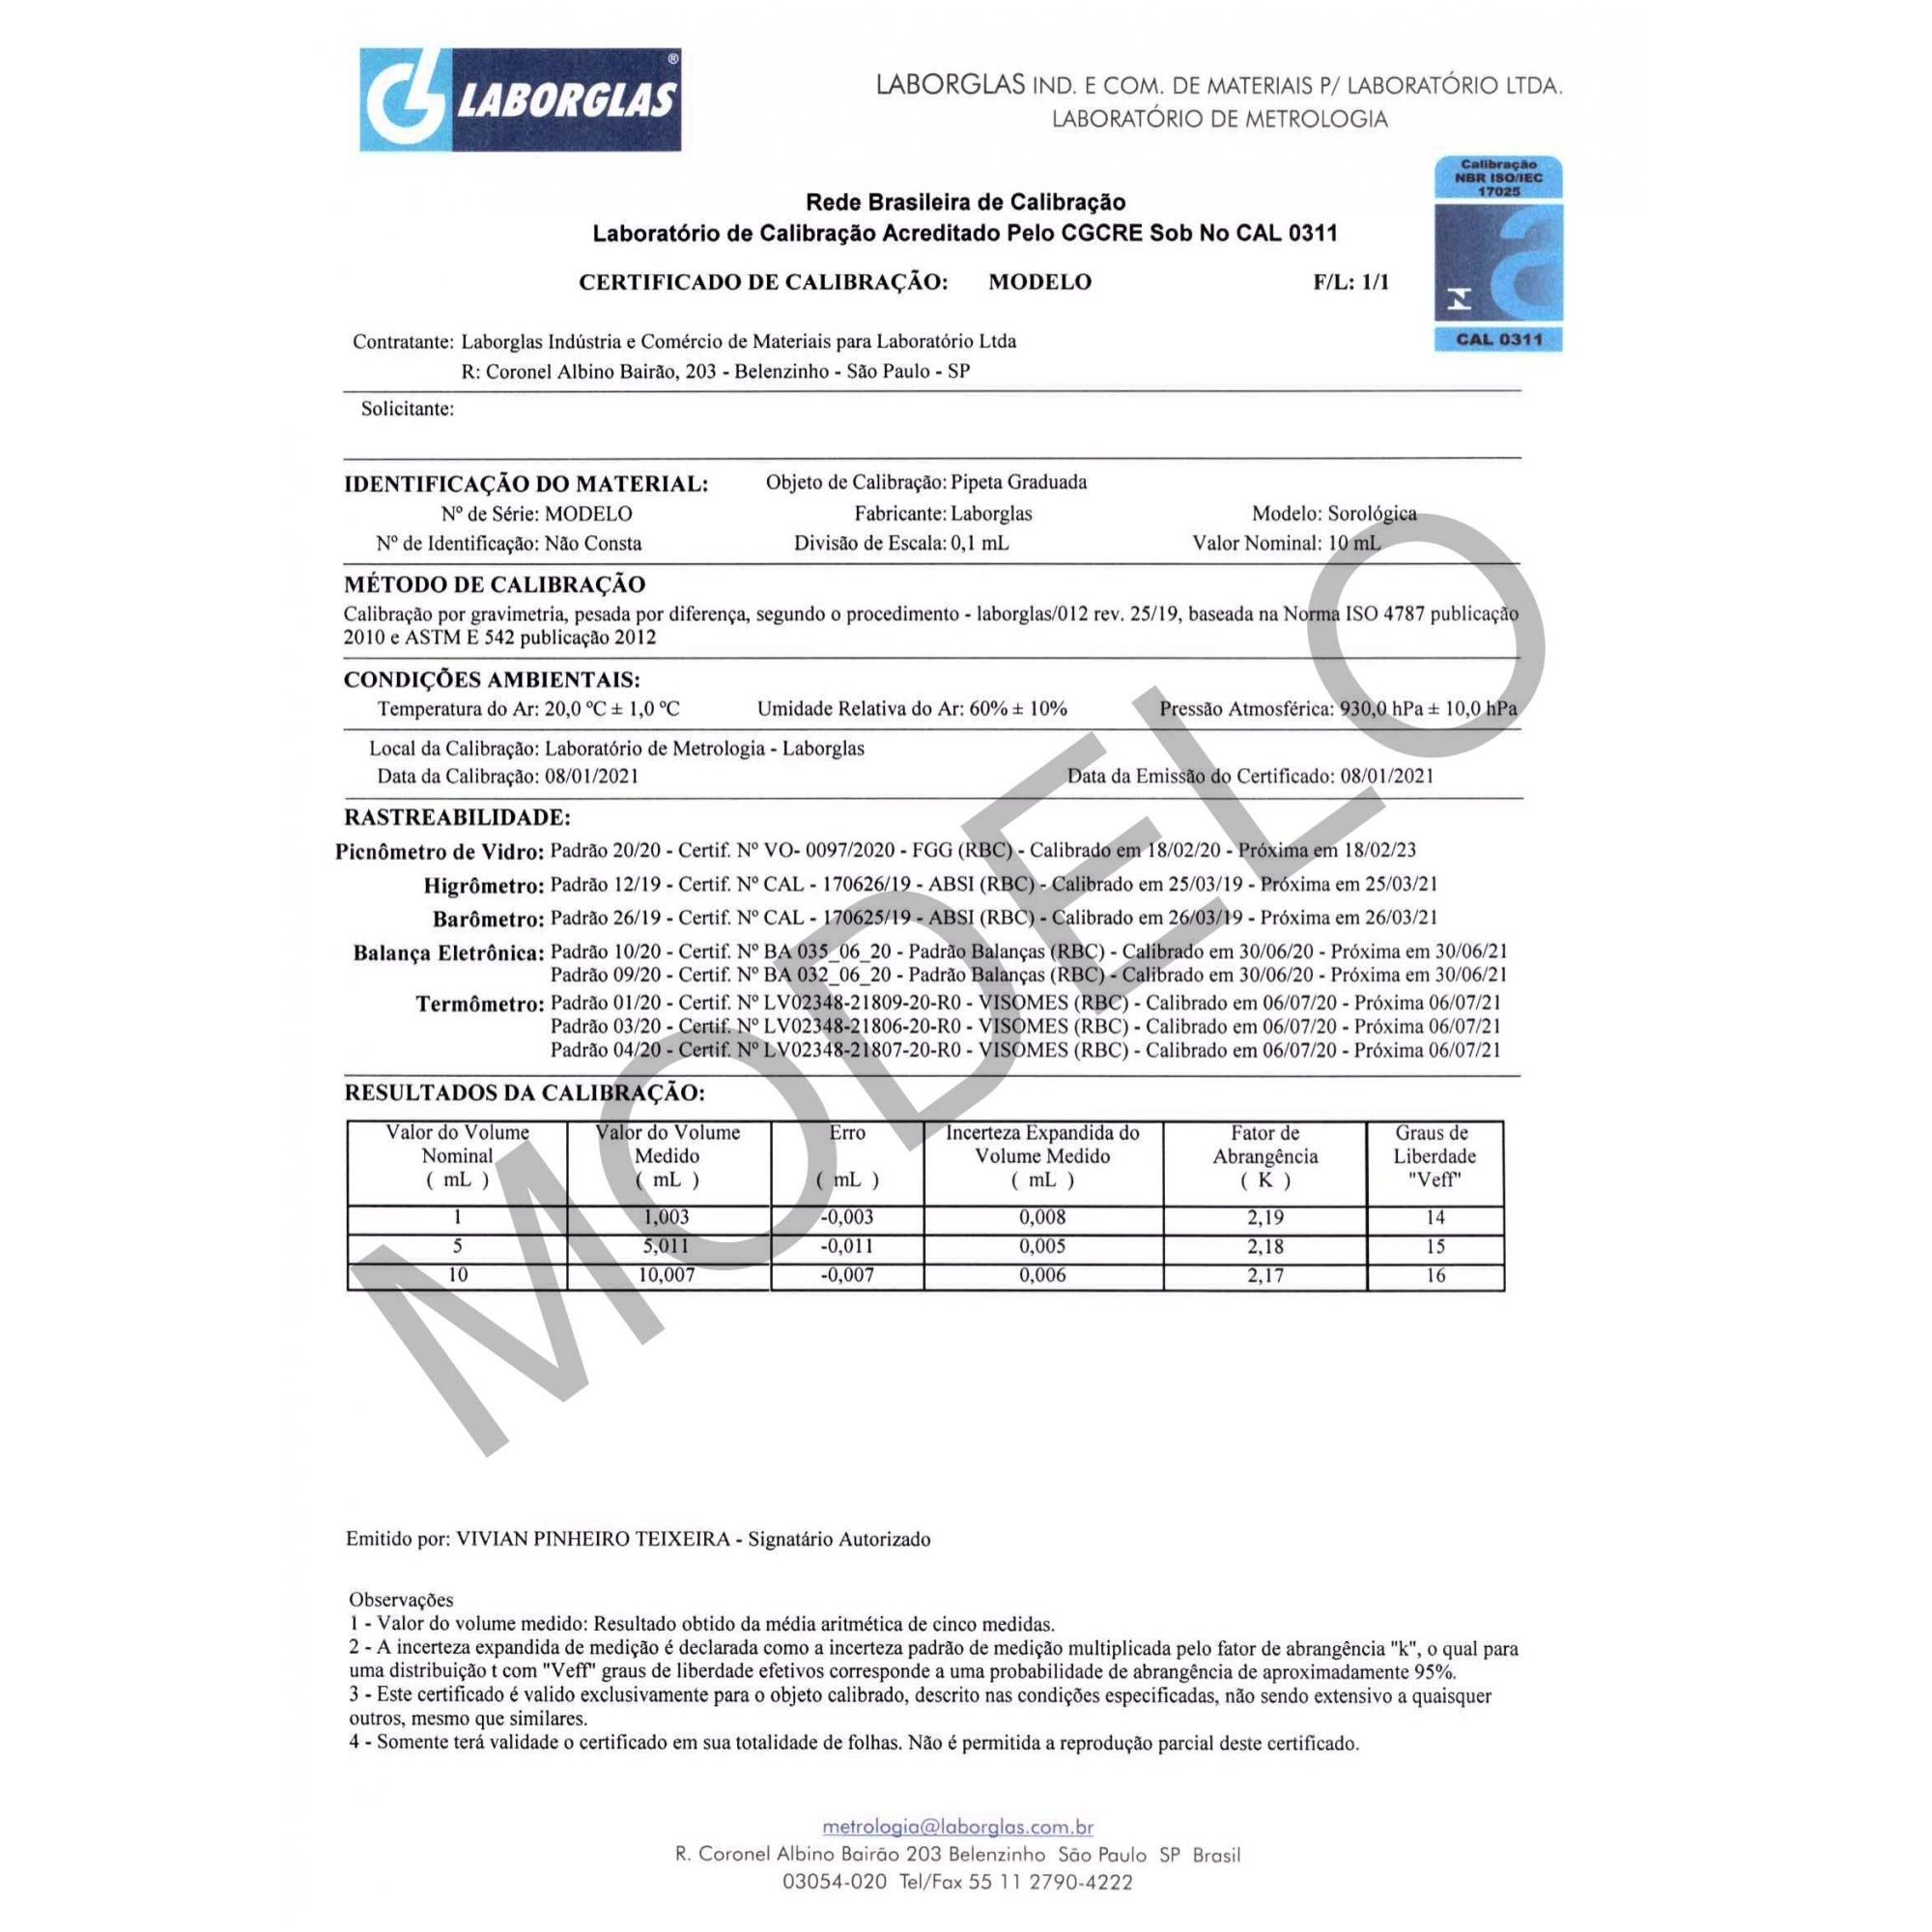 PIPETA GRAD. SOROL. ESGOT. TOTAL 1 ML 1/100 COM CERTIFICADO RBC - Laborglas - Cód. 9434307-R